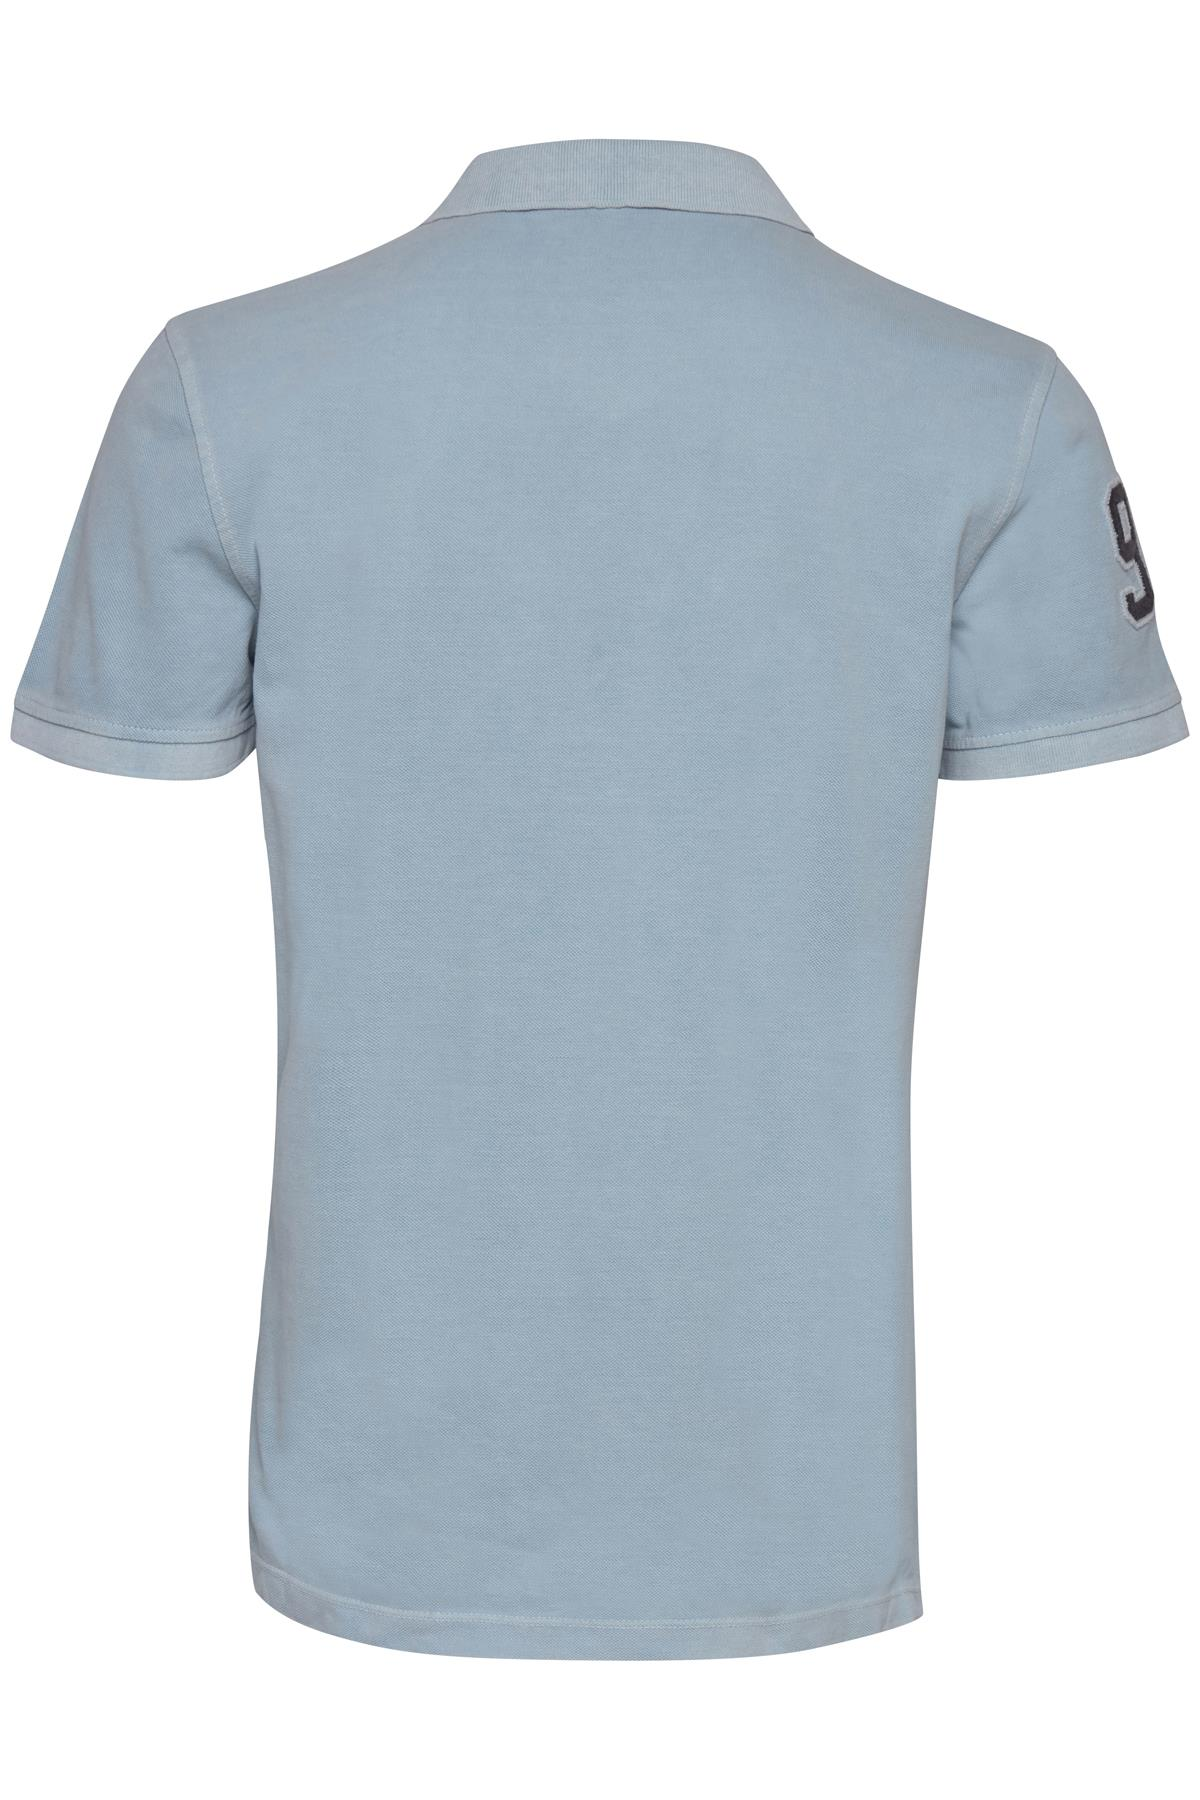 Soft Blue Polo shirt fra Blend He – Køb Soft Blue Polo shirt fra str. S-XXL her